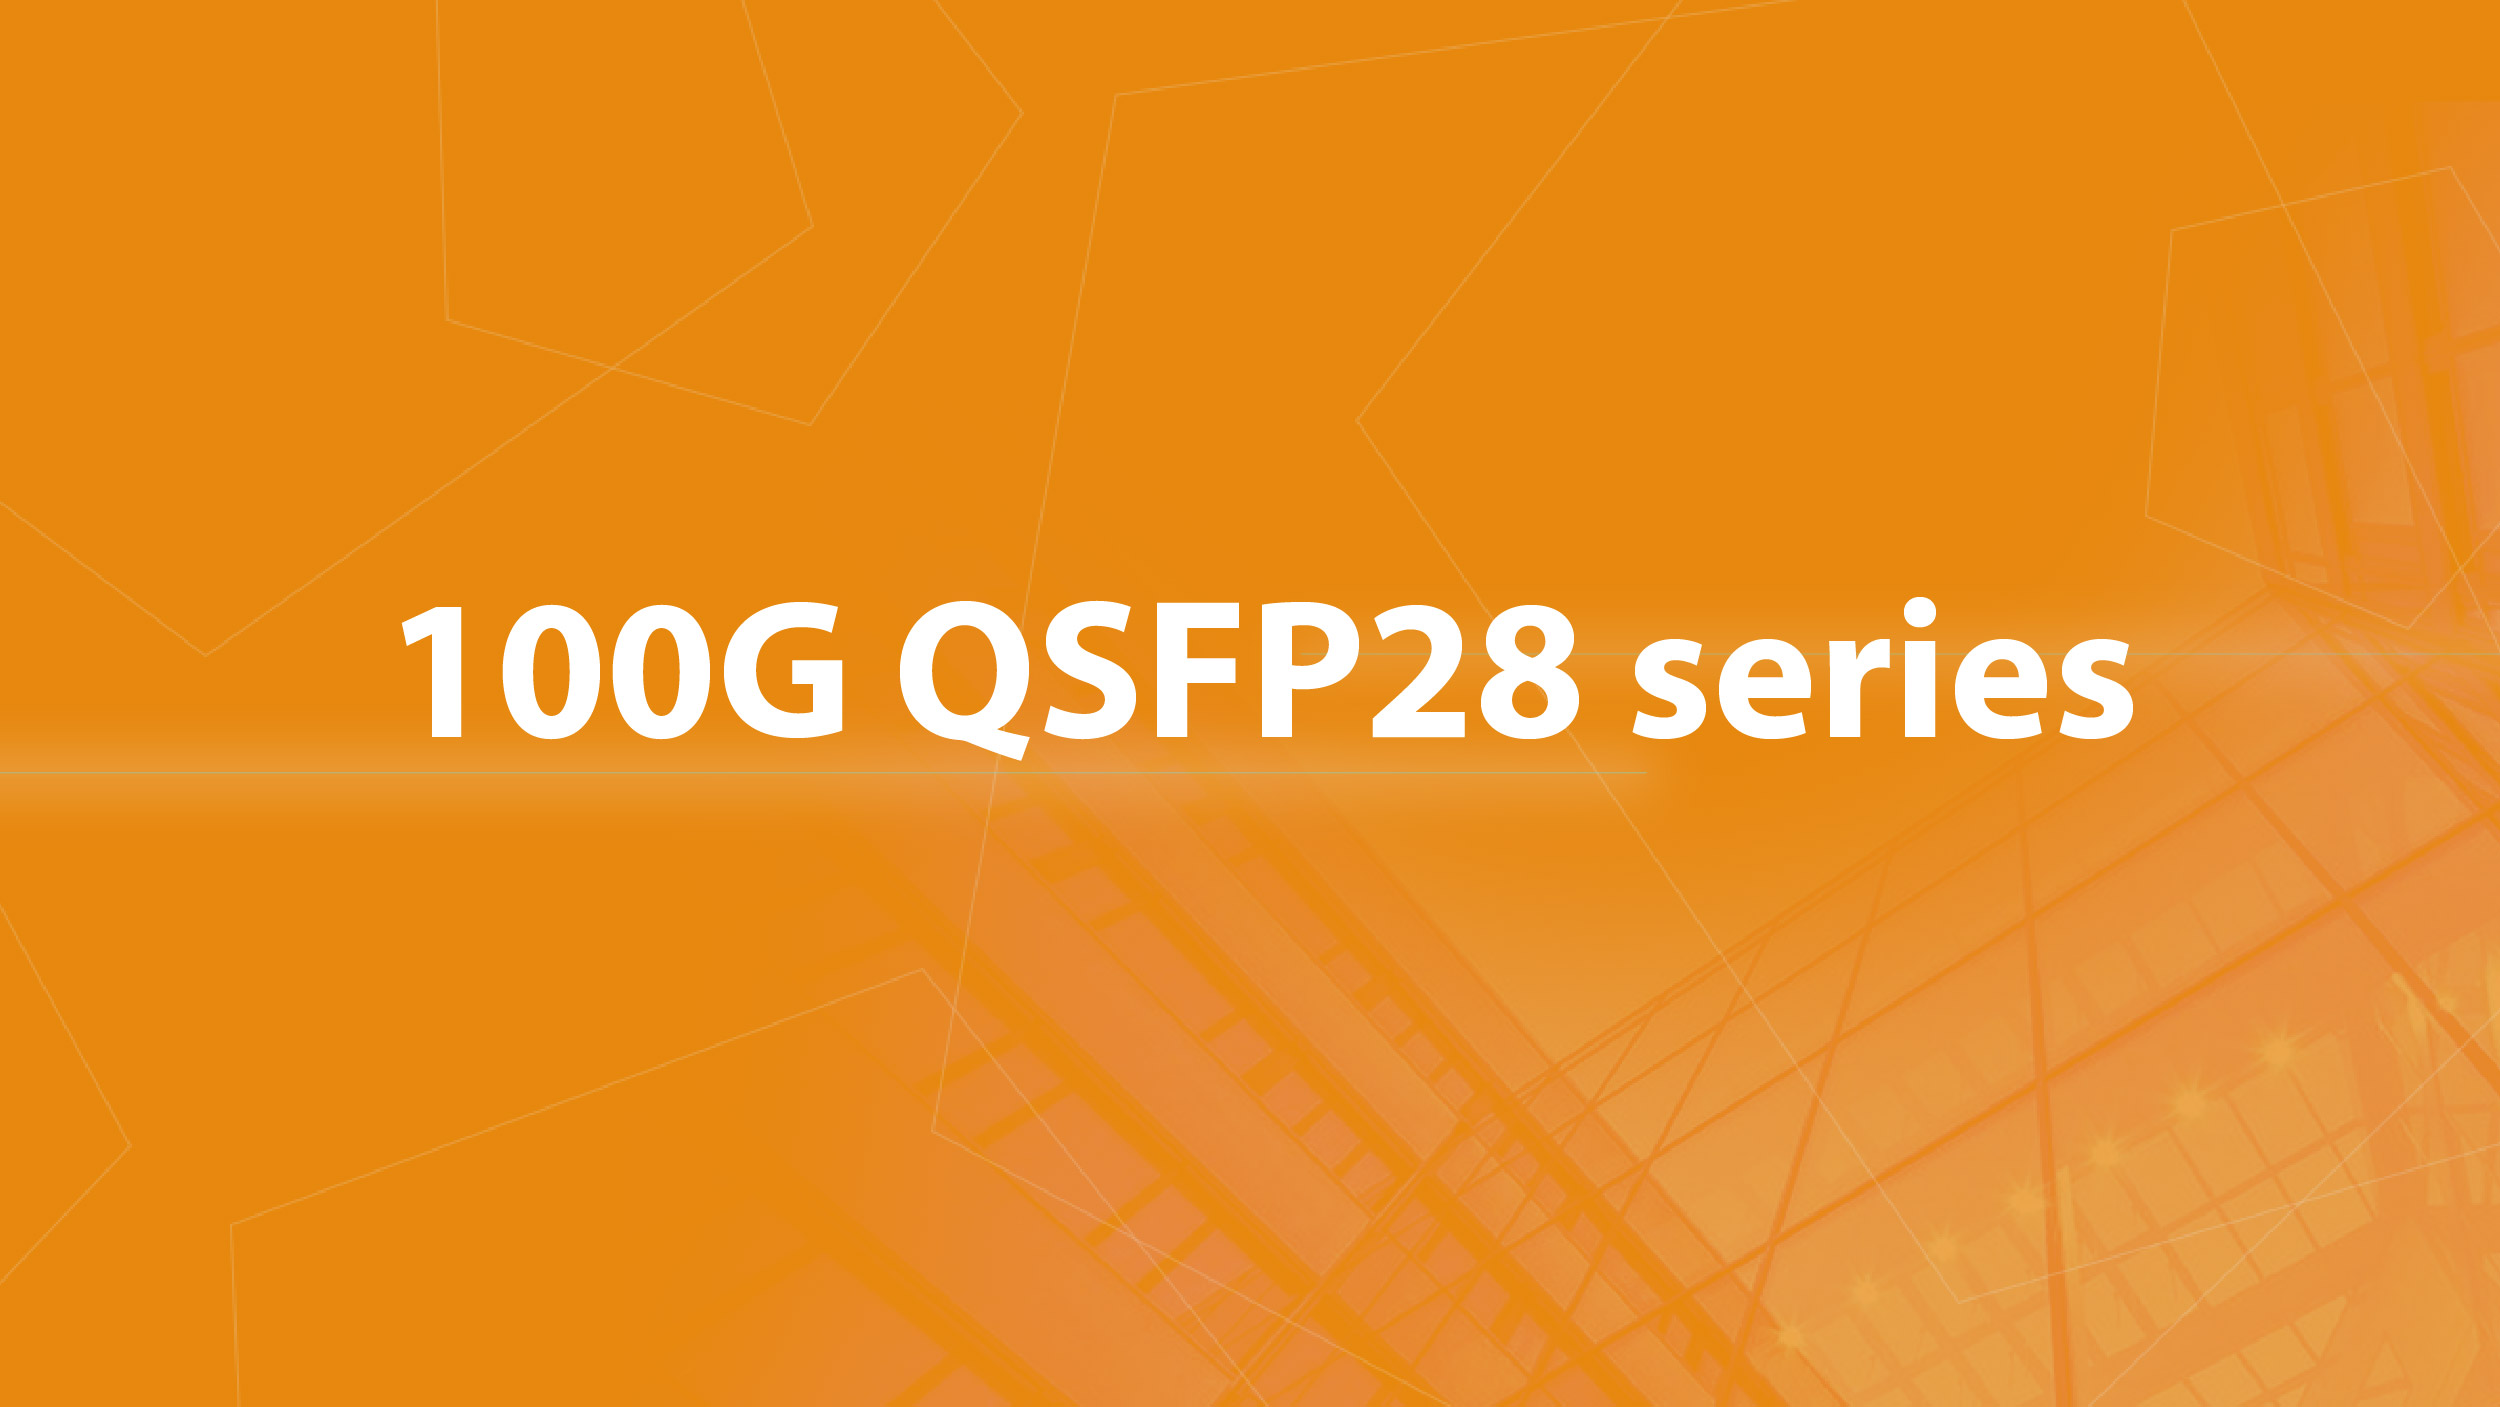 100G QSFP28 series